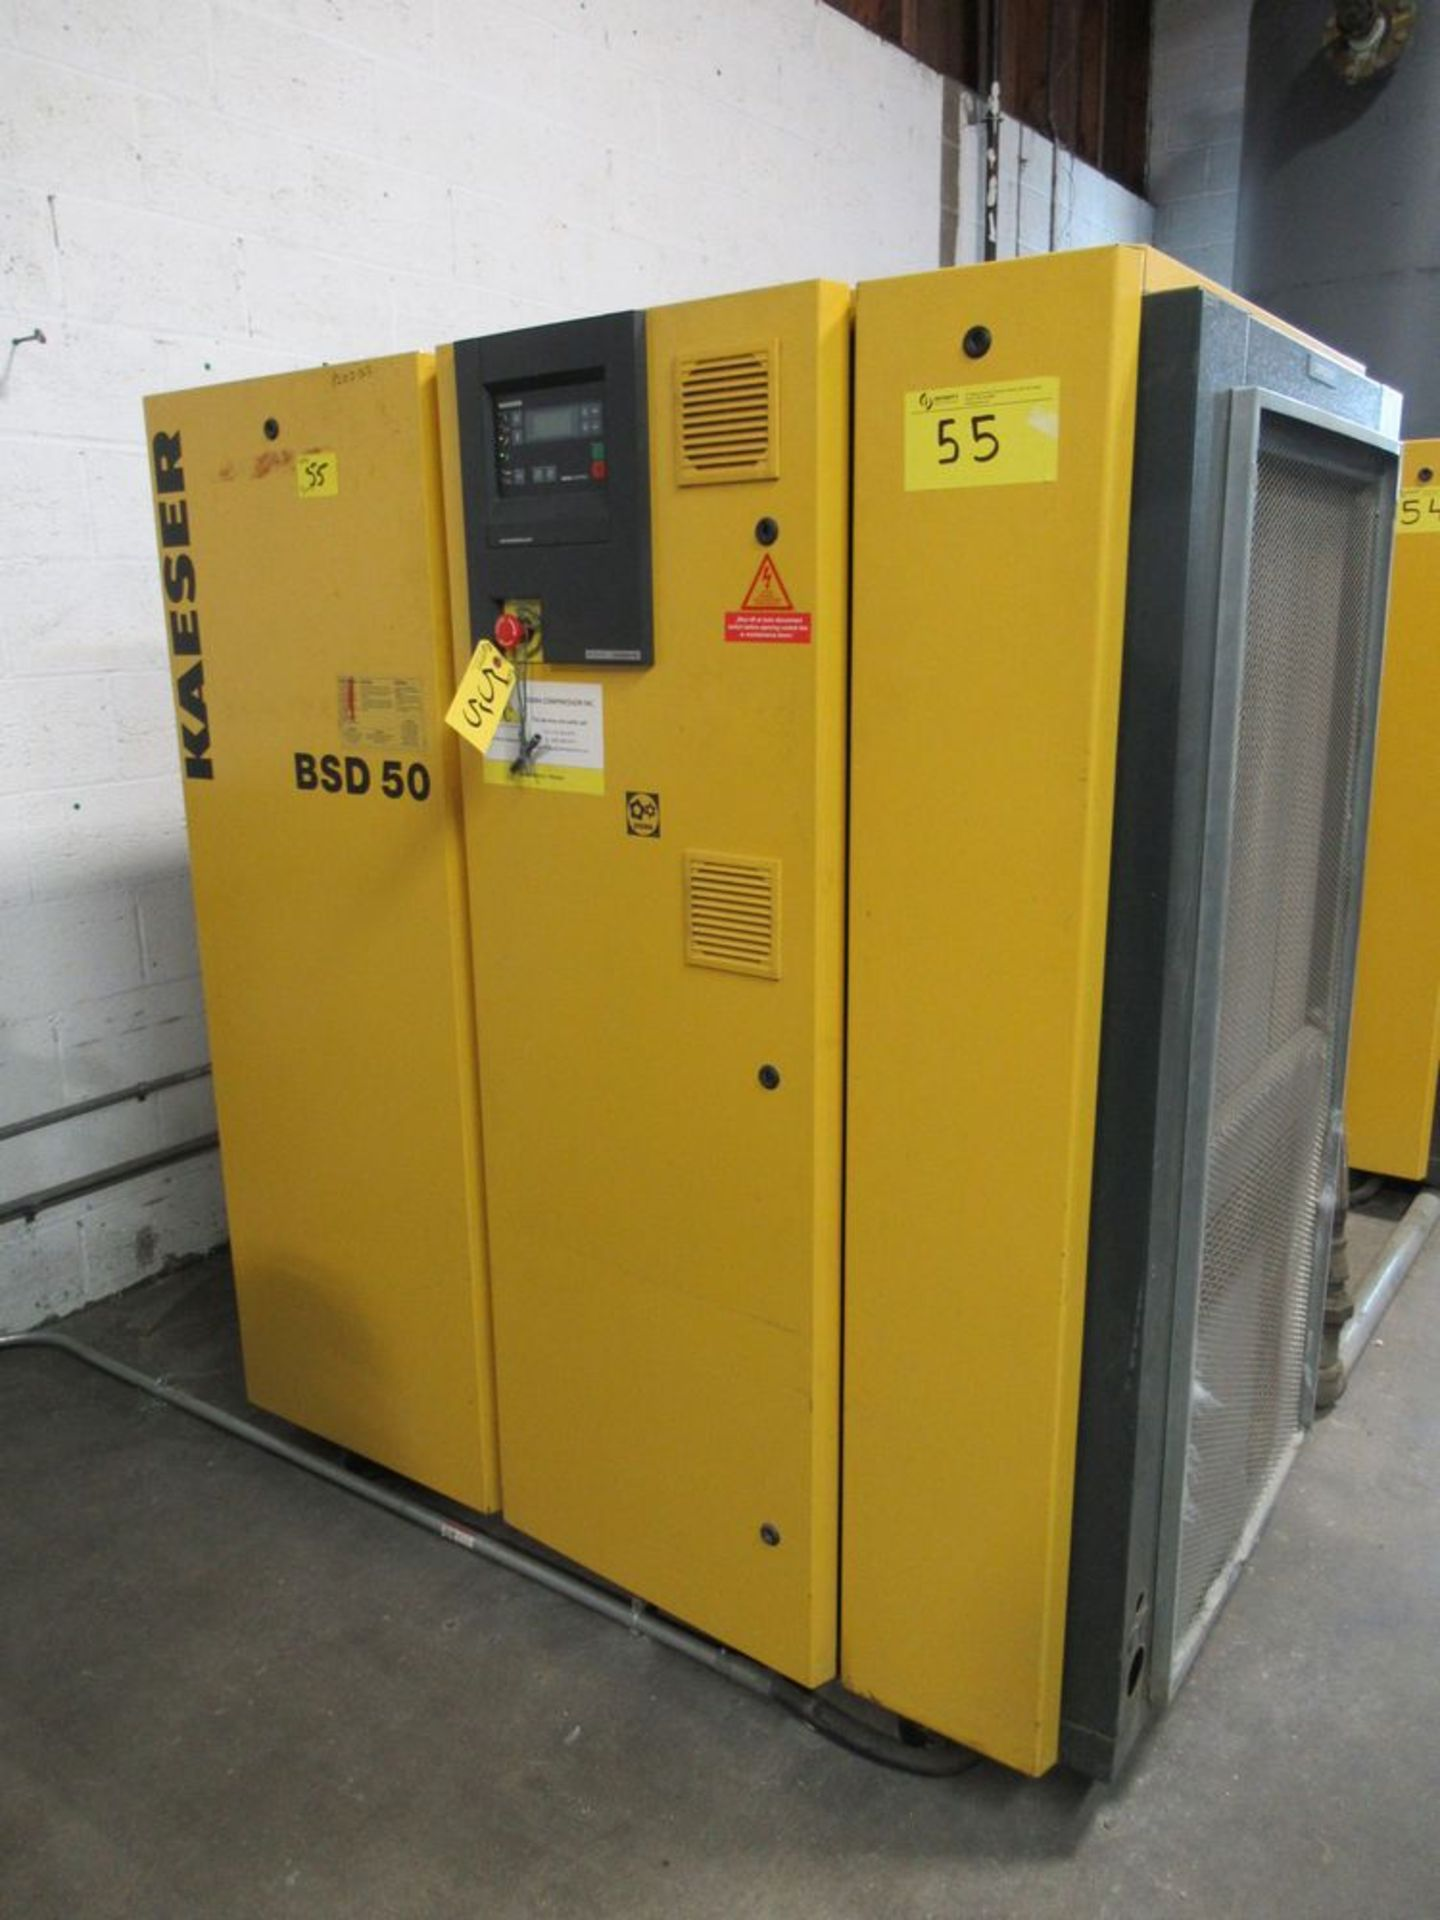 2002 KAESER BSD-50 50HP AIR COMPRESSOR W/ SIGMA CONTROL, S/N 1002 - Image 2 of 4